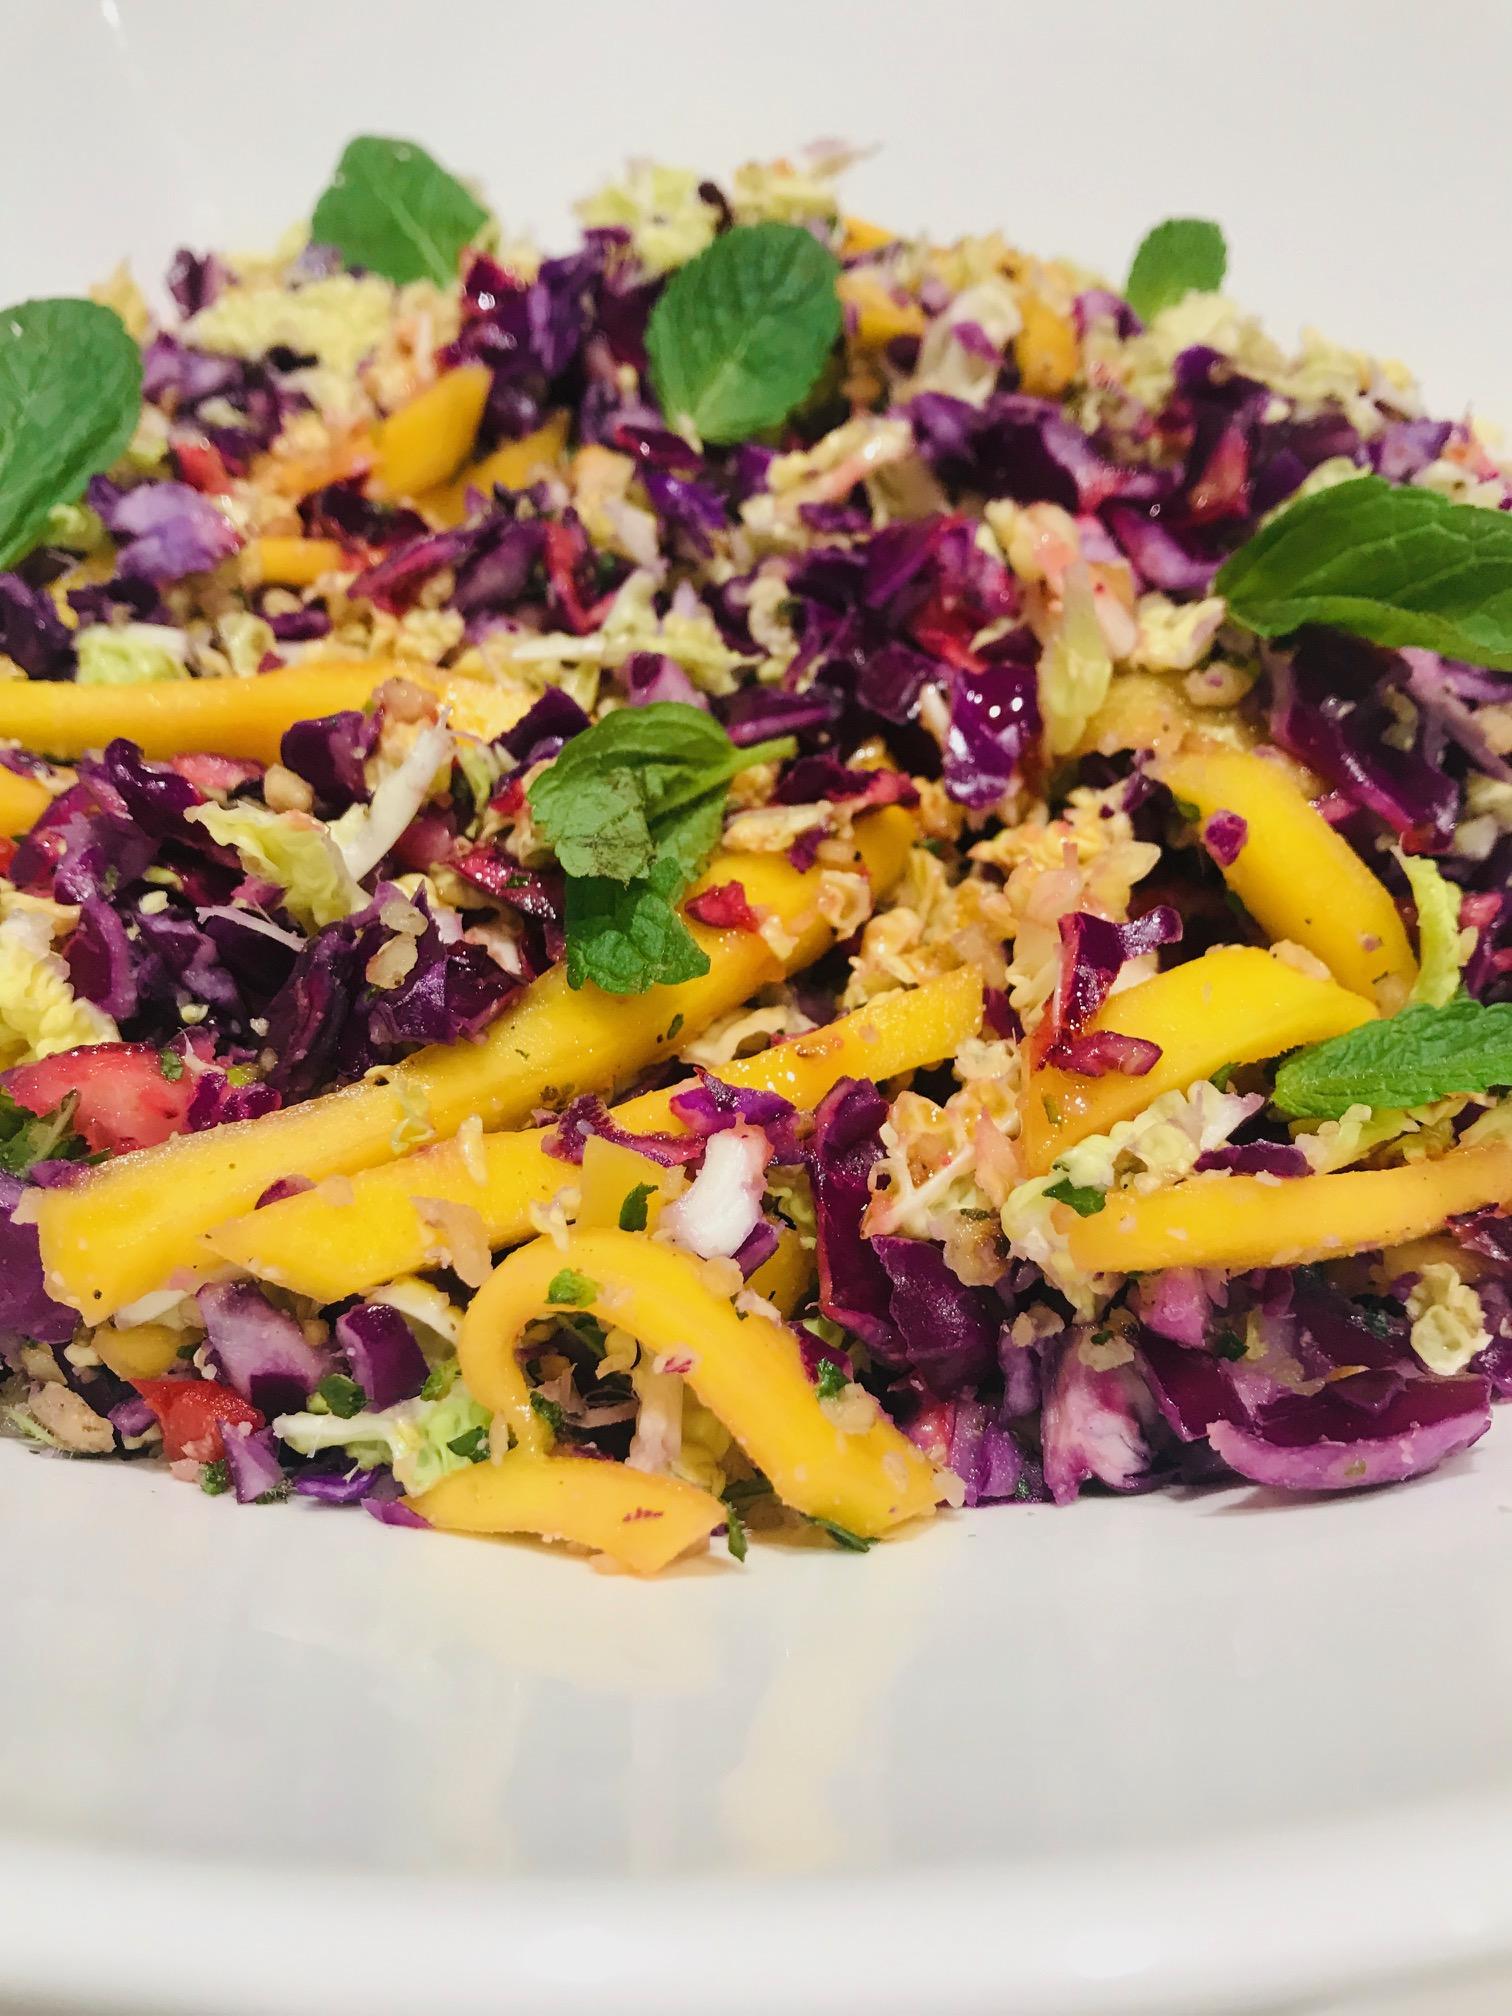 salade vol kleur